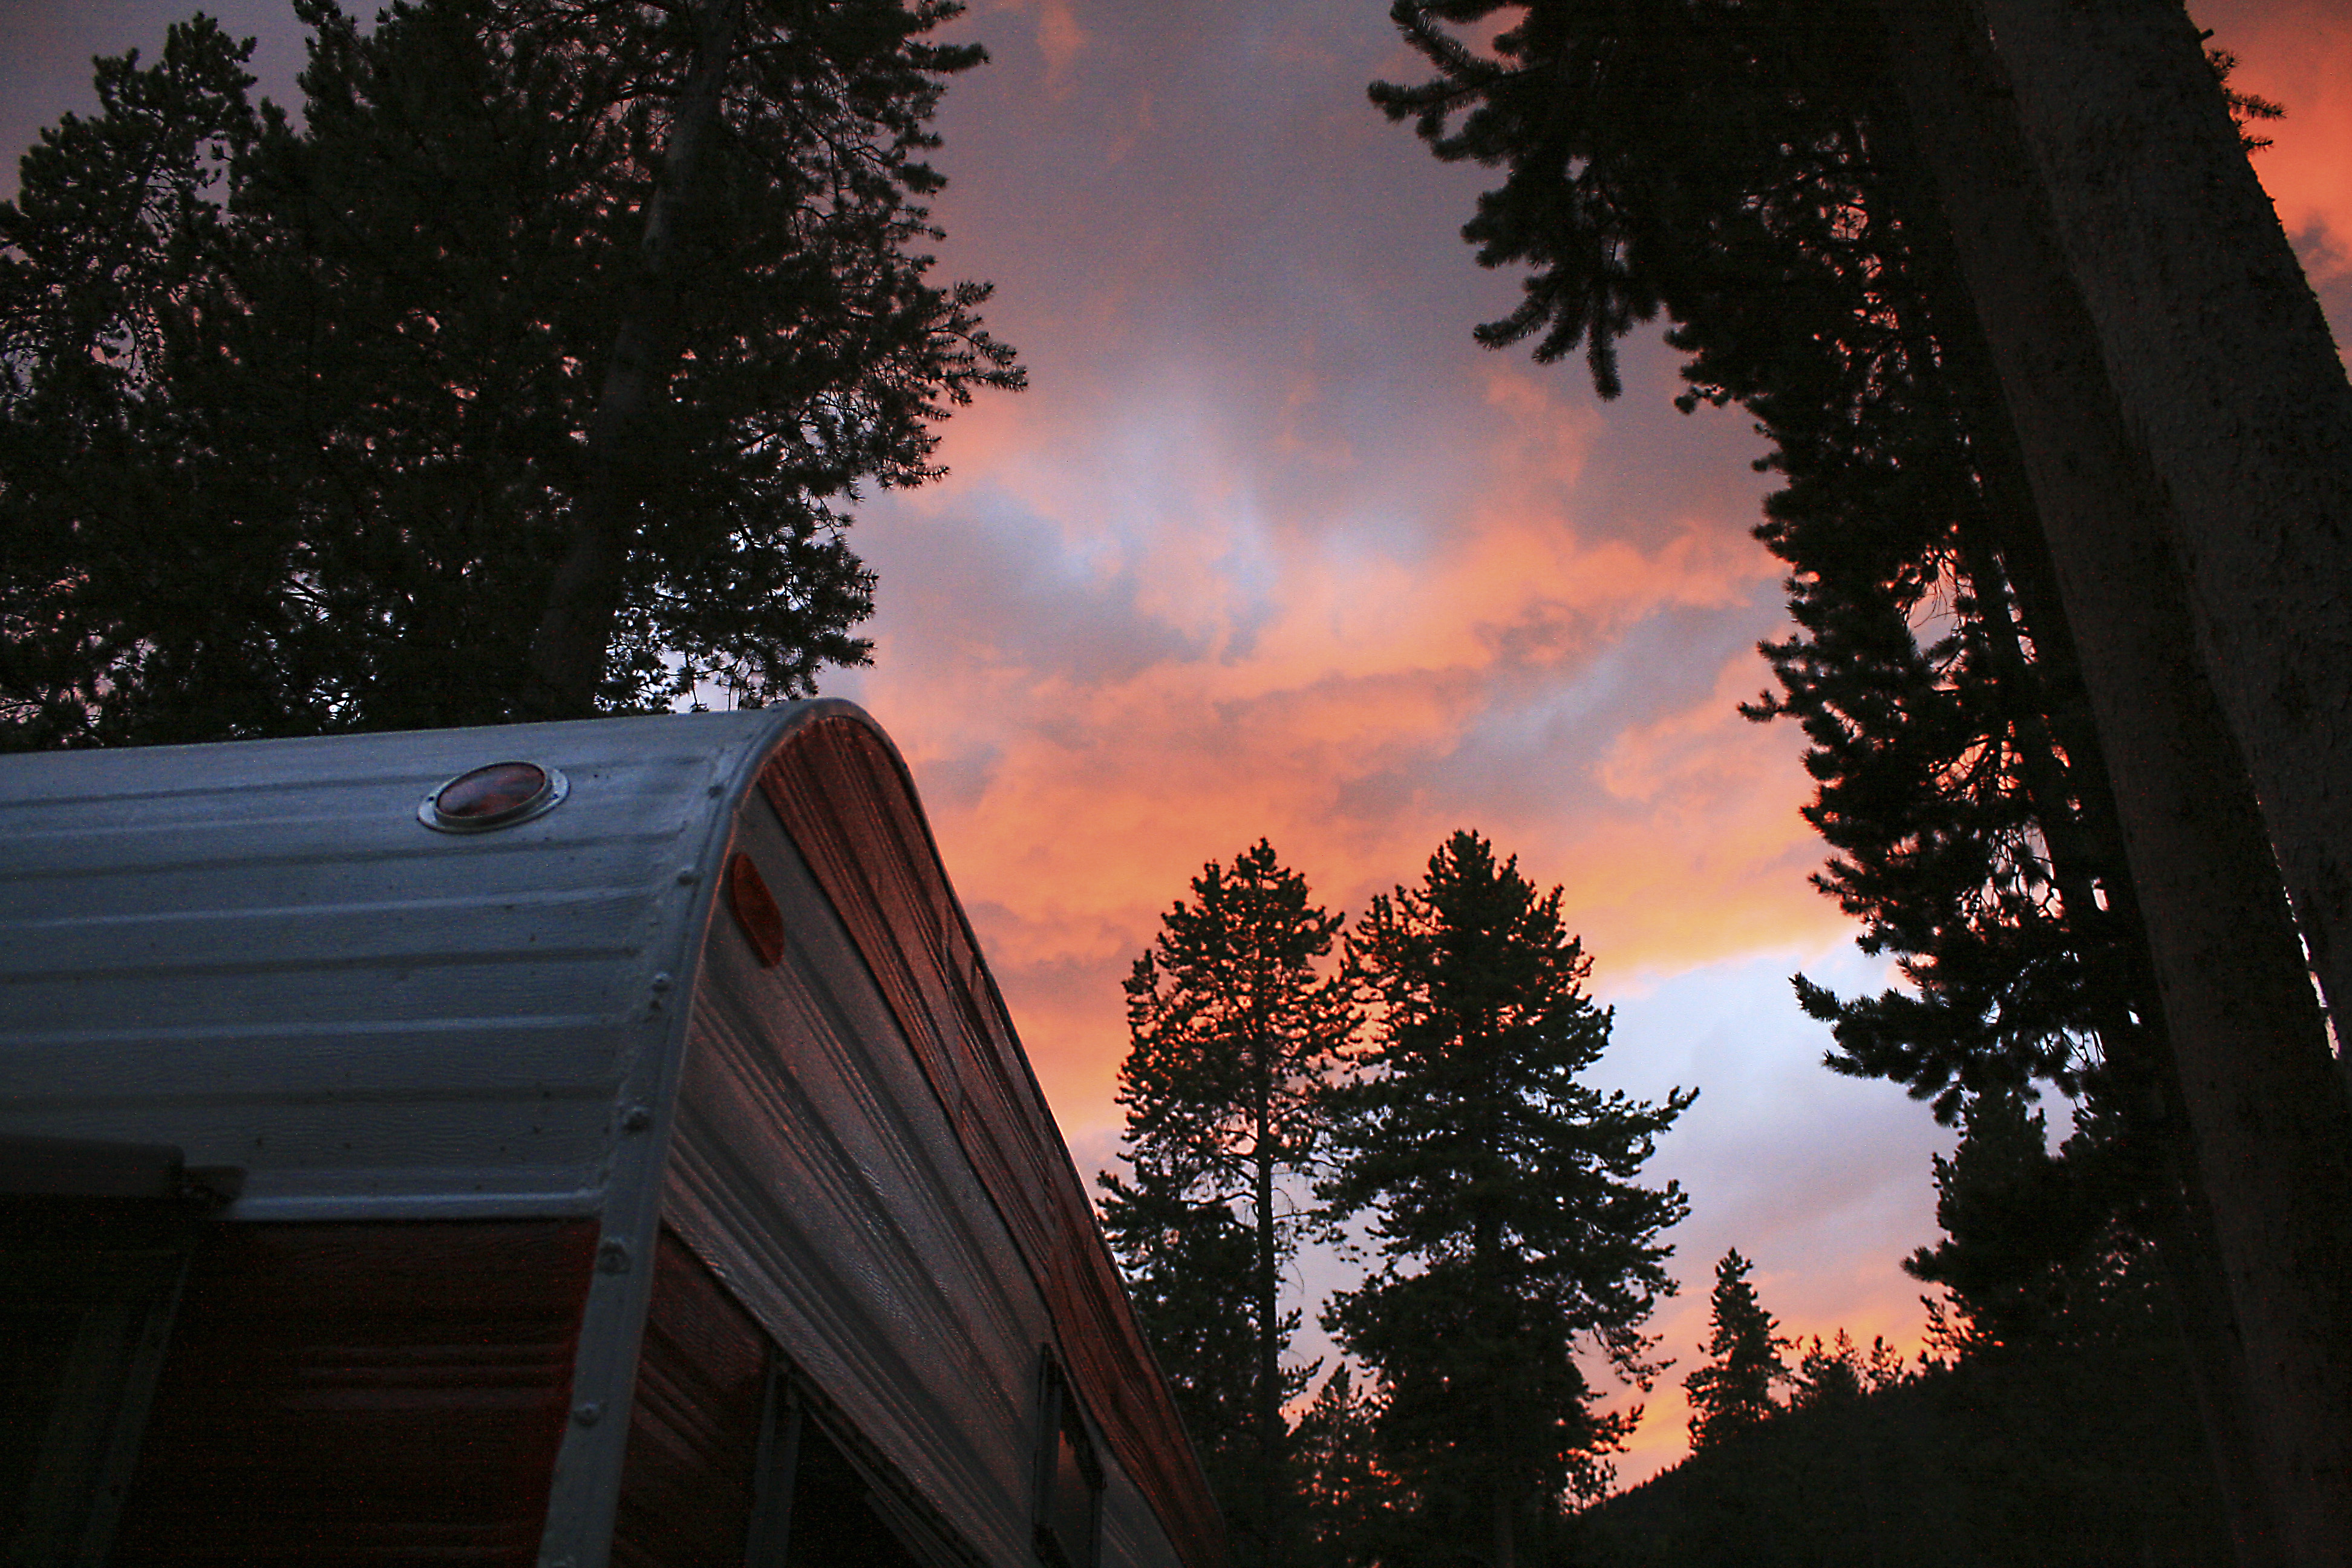 Sunset at Yellowstone National Park, Wyoming